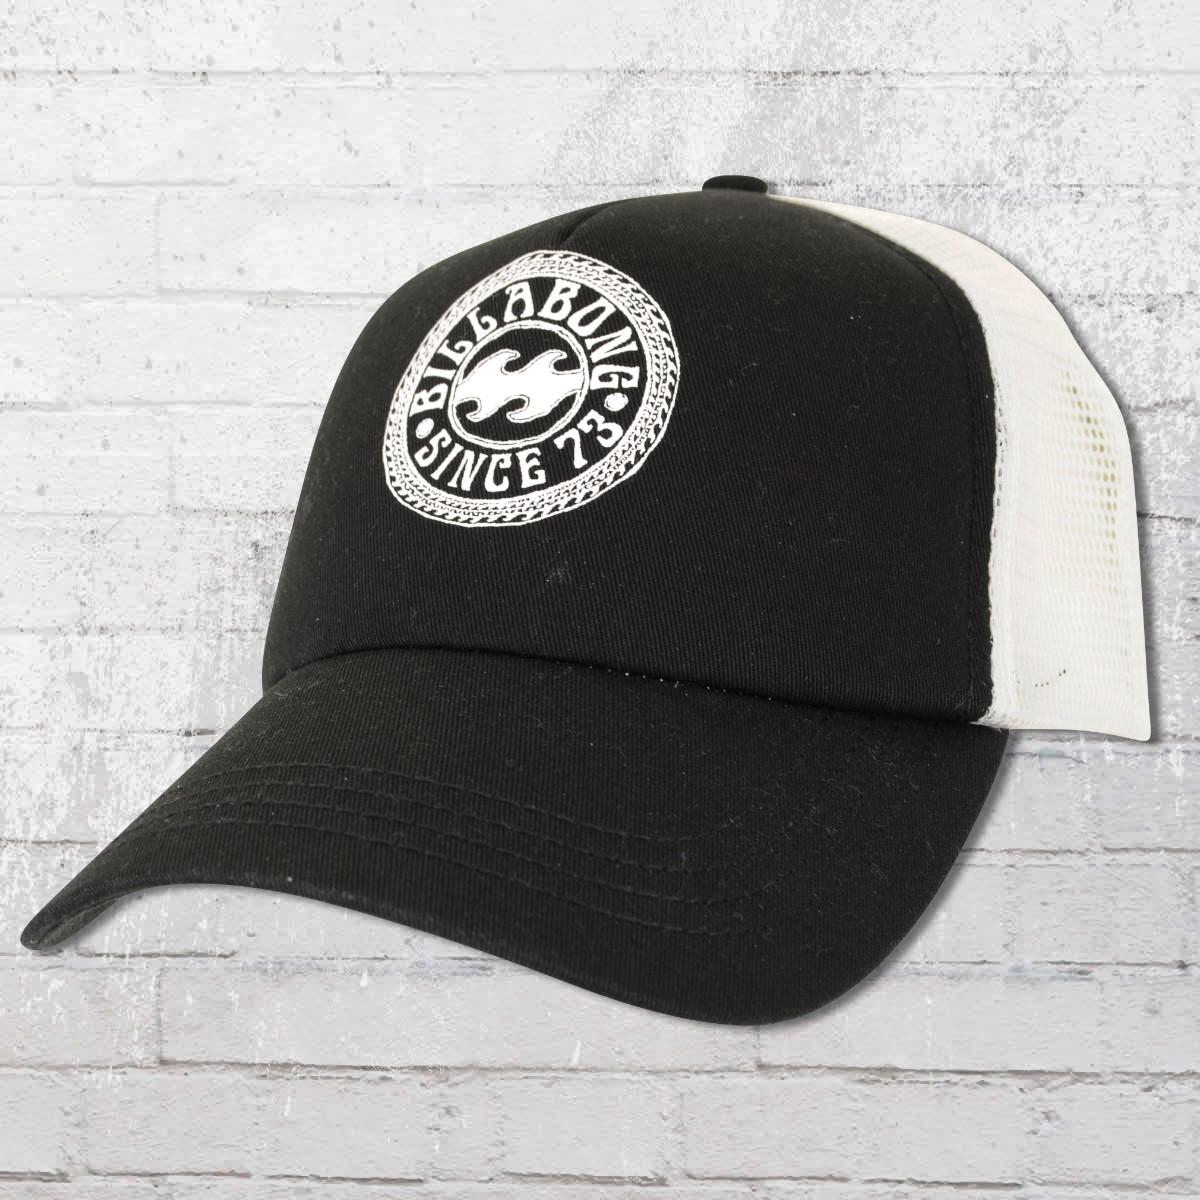 fae4279334a79c ... shopping billabong cap mesh trucker hat black white. u203au2039 959ff  28fc7